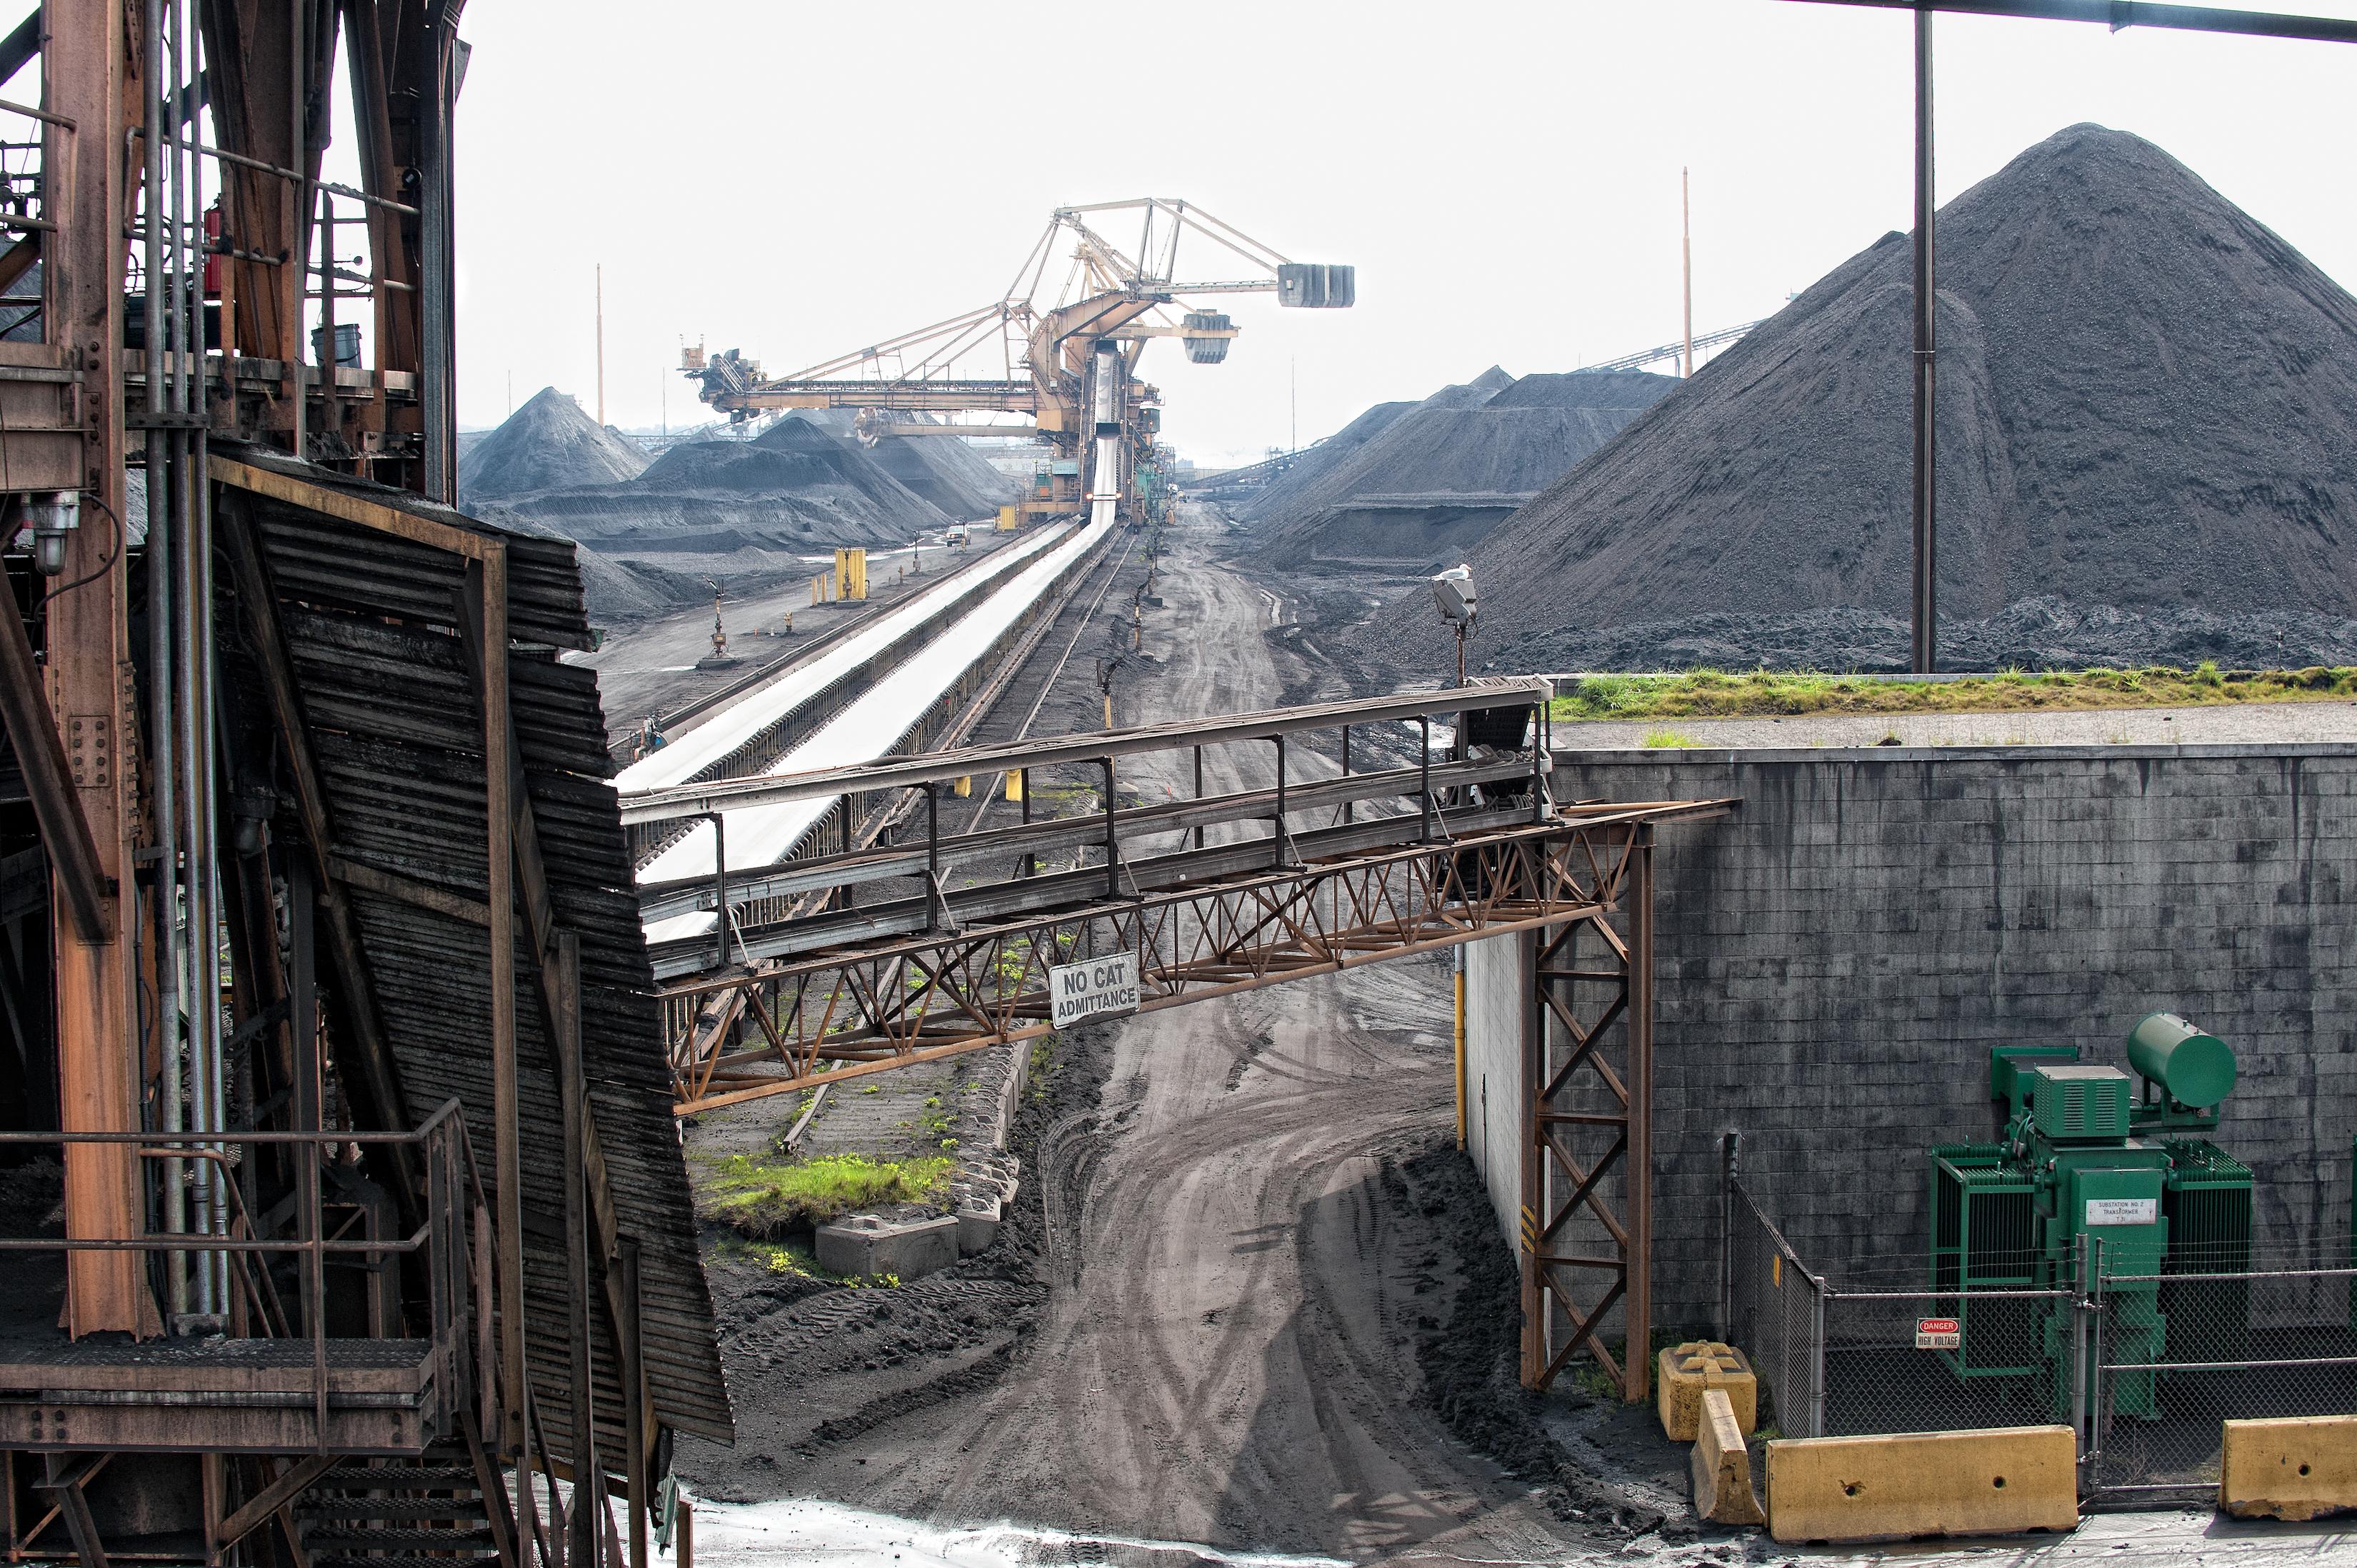 20110420-20110420-110420046Paul_K_Anderson_Coal.jpg